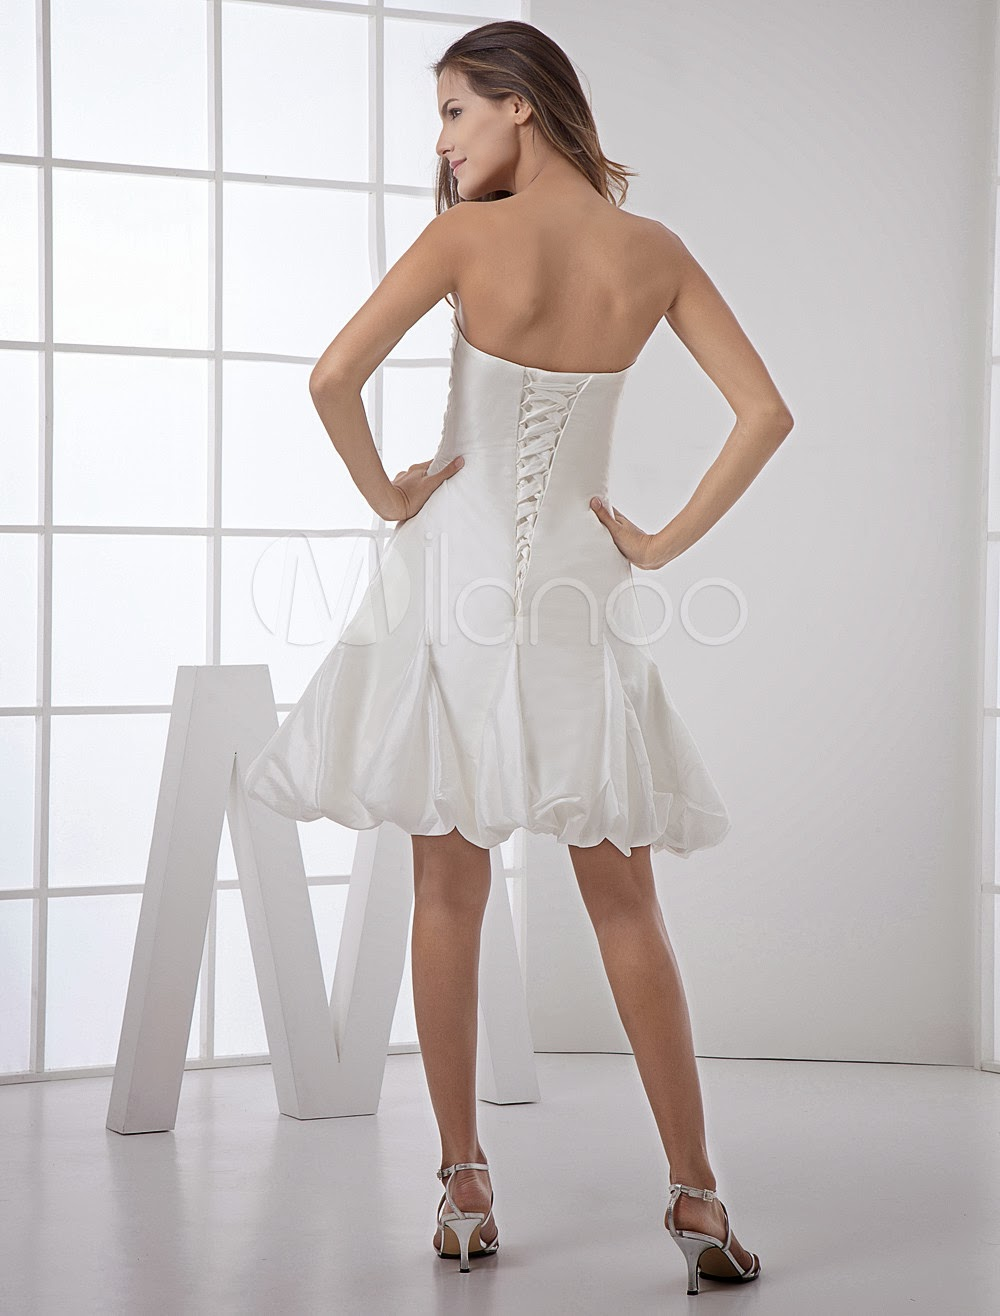 China Wholesale Dresses - Cute Strapless Sweetheart Knee Length Beading Taffeta Mini Wedding Dress